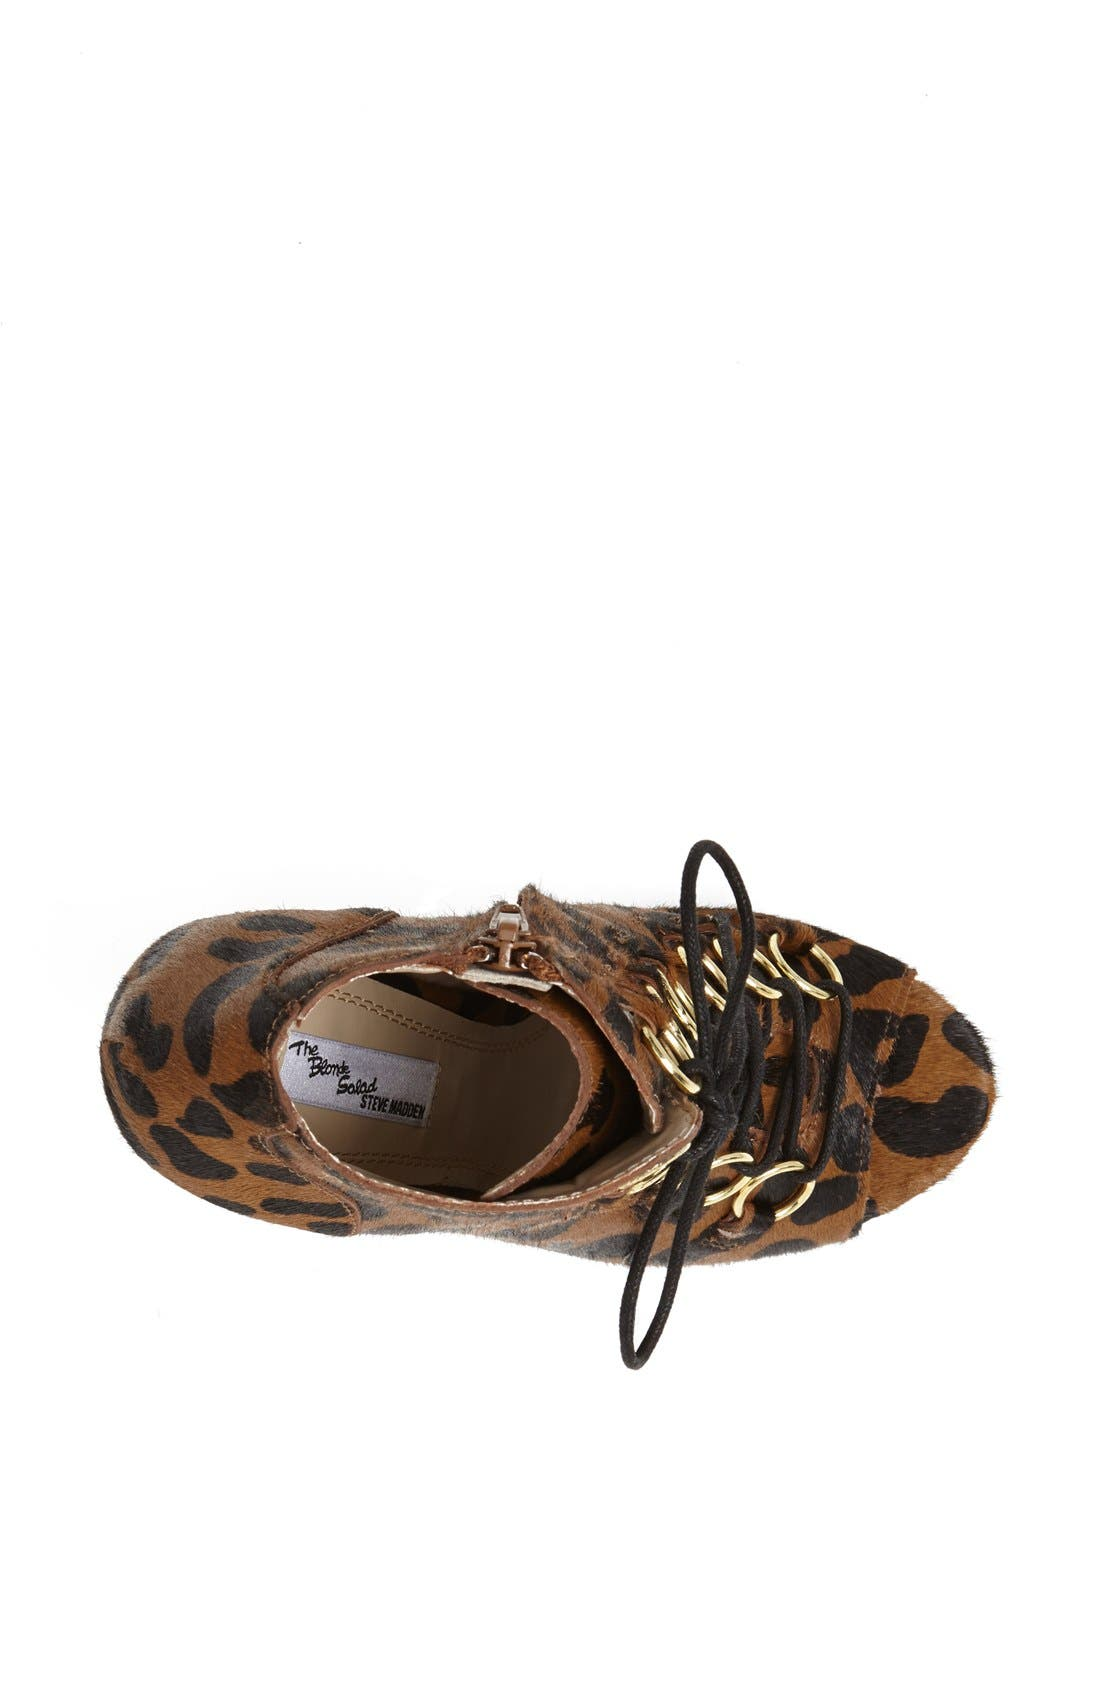 Alternate Image 3  - The Blonde Salad x Steve Madden 'Milan' Leopard Print Calf Hair Peep Toe Bootie